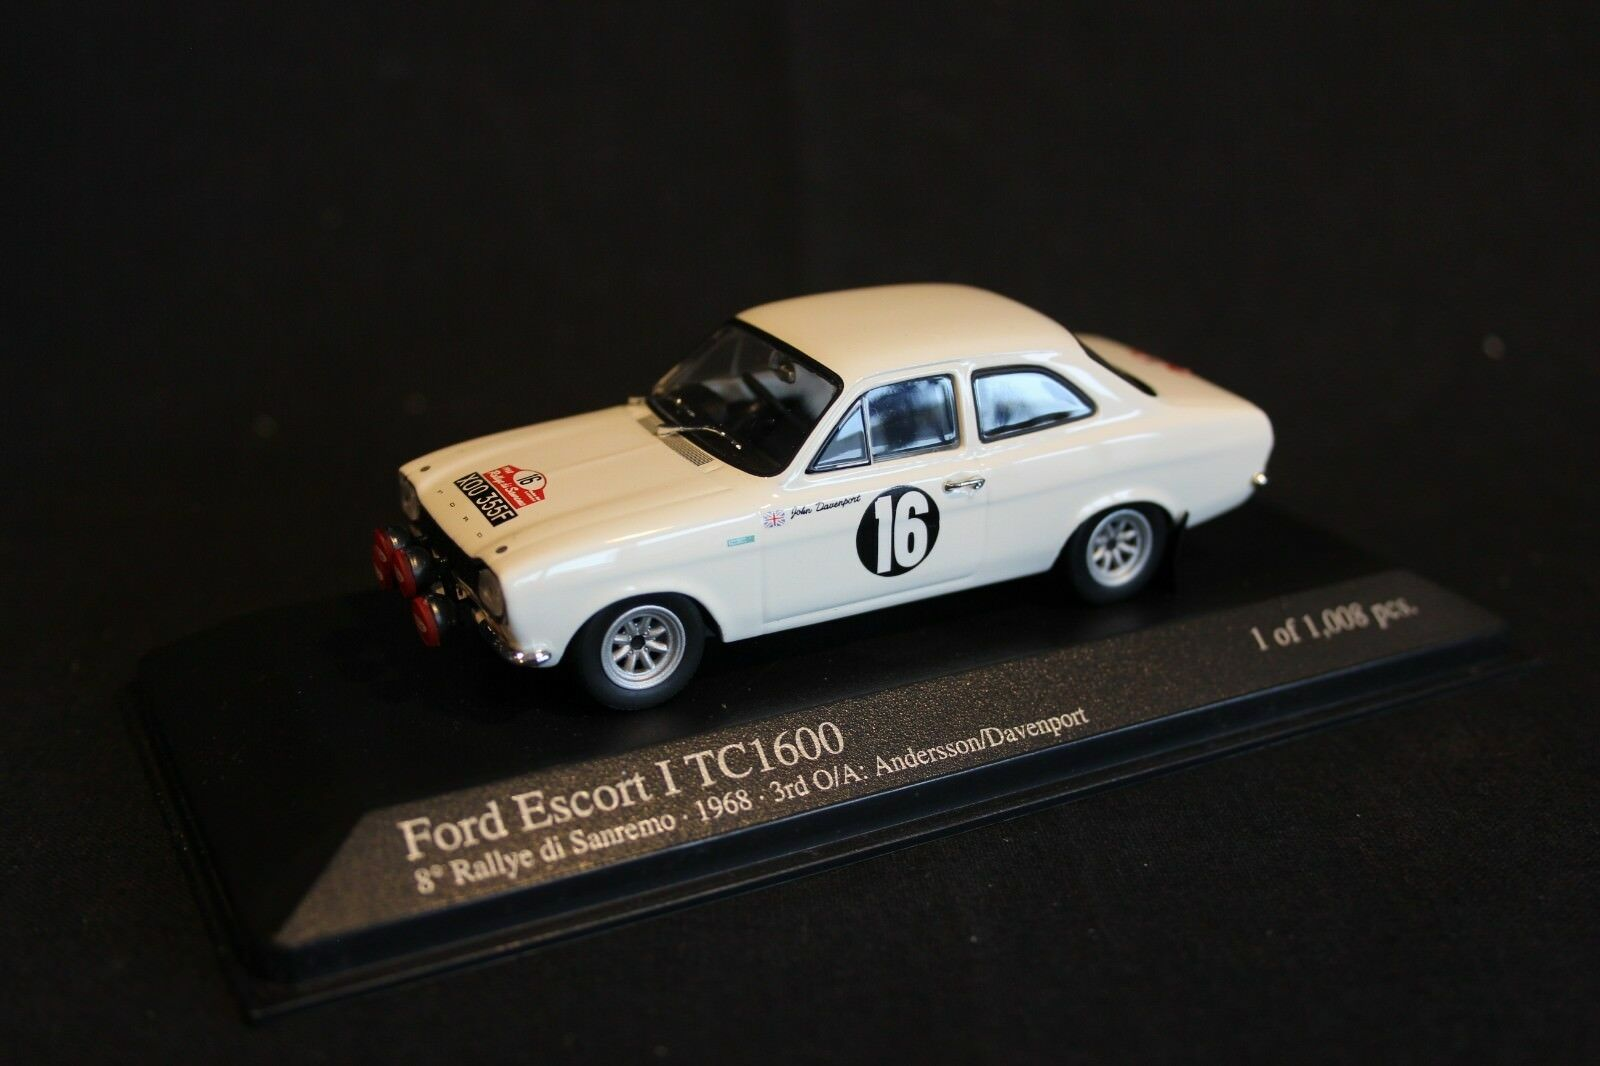 protección post-venta Minichamps Ford Escord Mk1 TC 1600 1968 1 43    16 Andersson   Davenport Sanremo  Vuelta de 10 dias